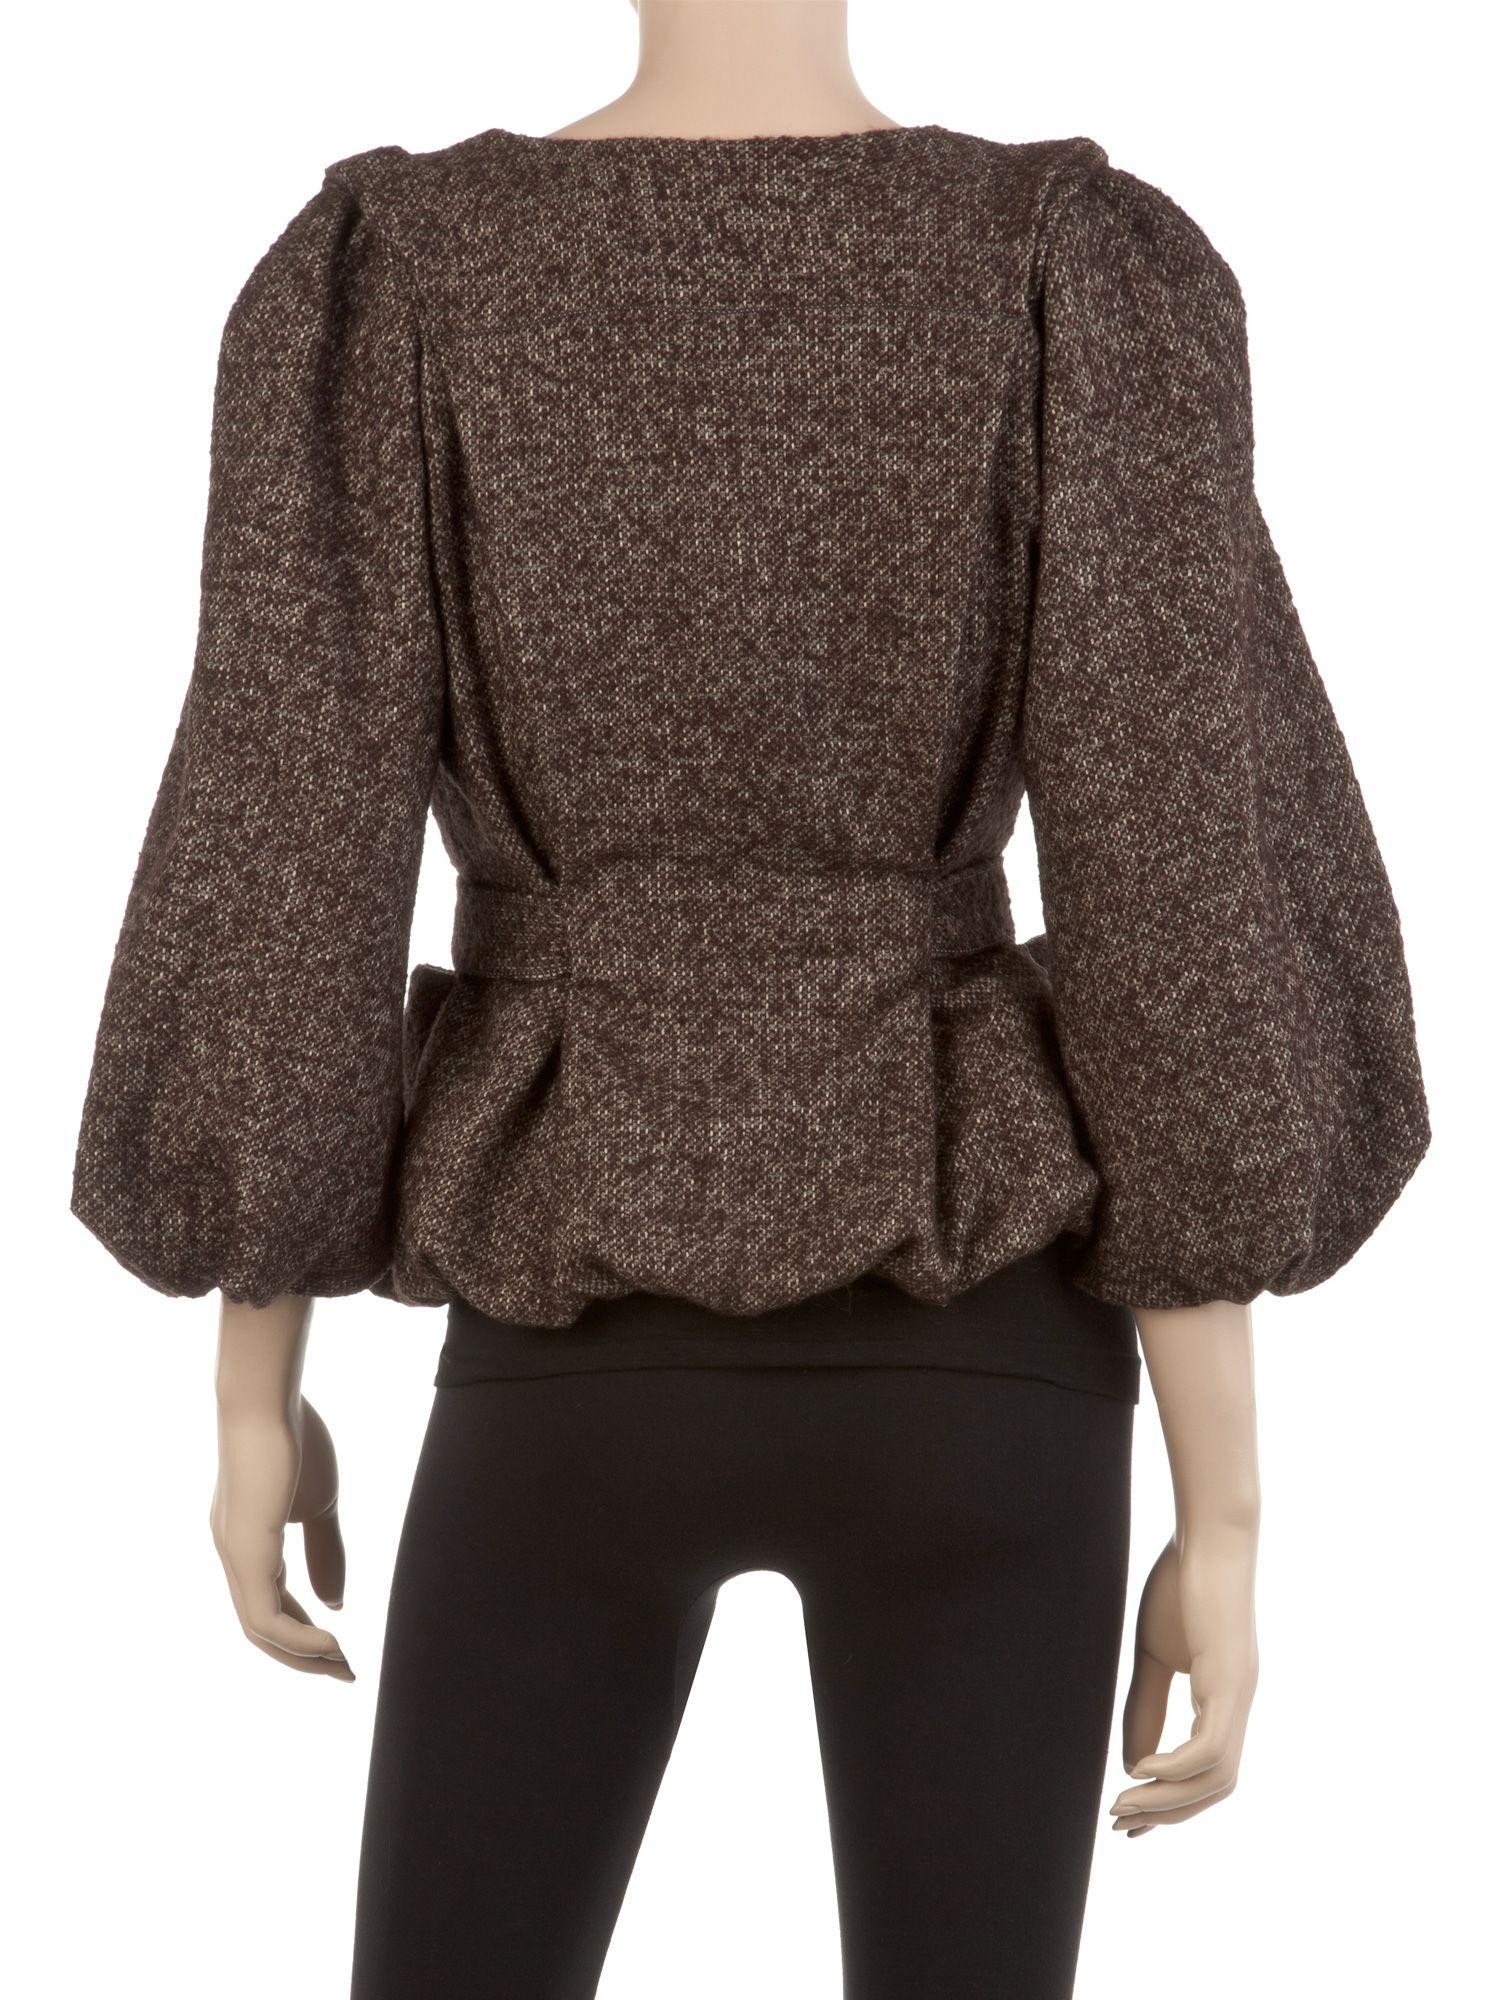 Heathered Wool Tweed Blouson Jacket   Designer Dressy Jackets - Max Studio> Back view for my Max Mara alteration idea REd tweed suit